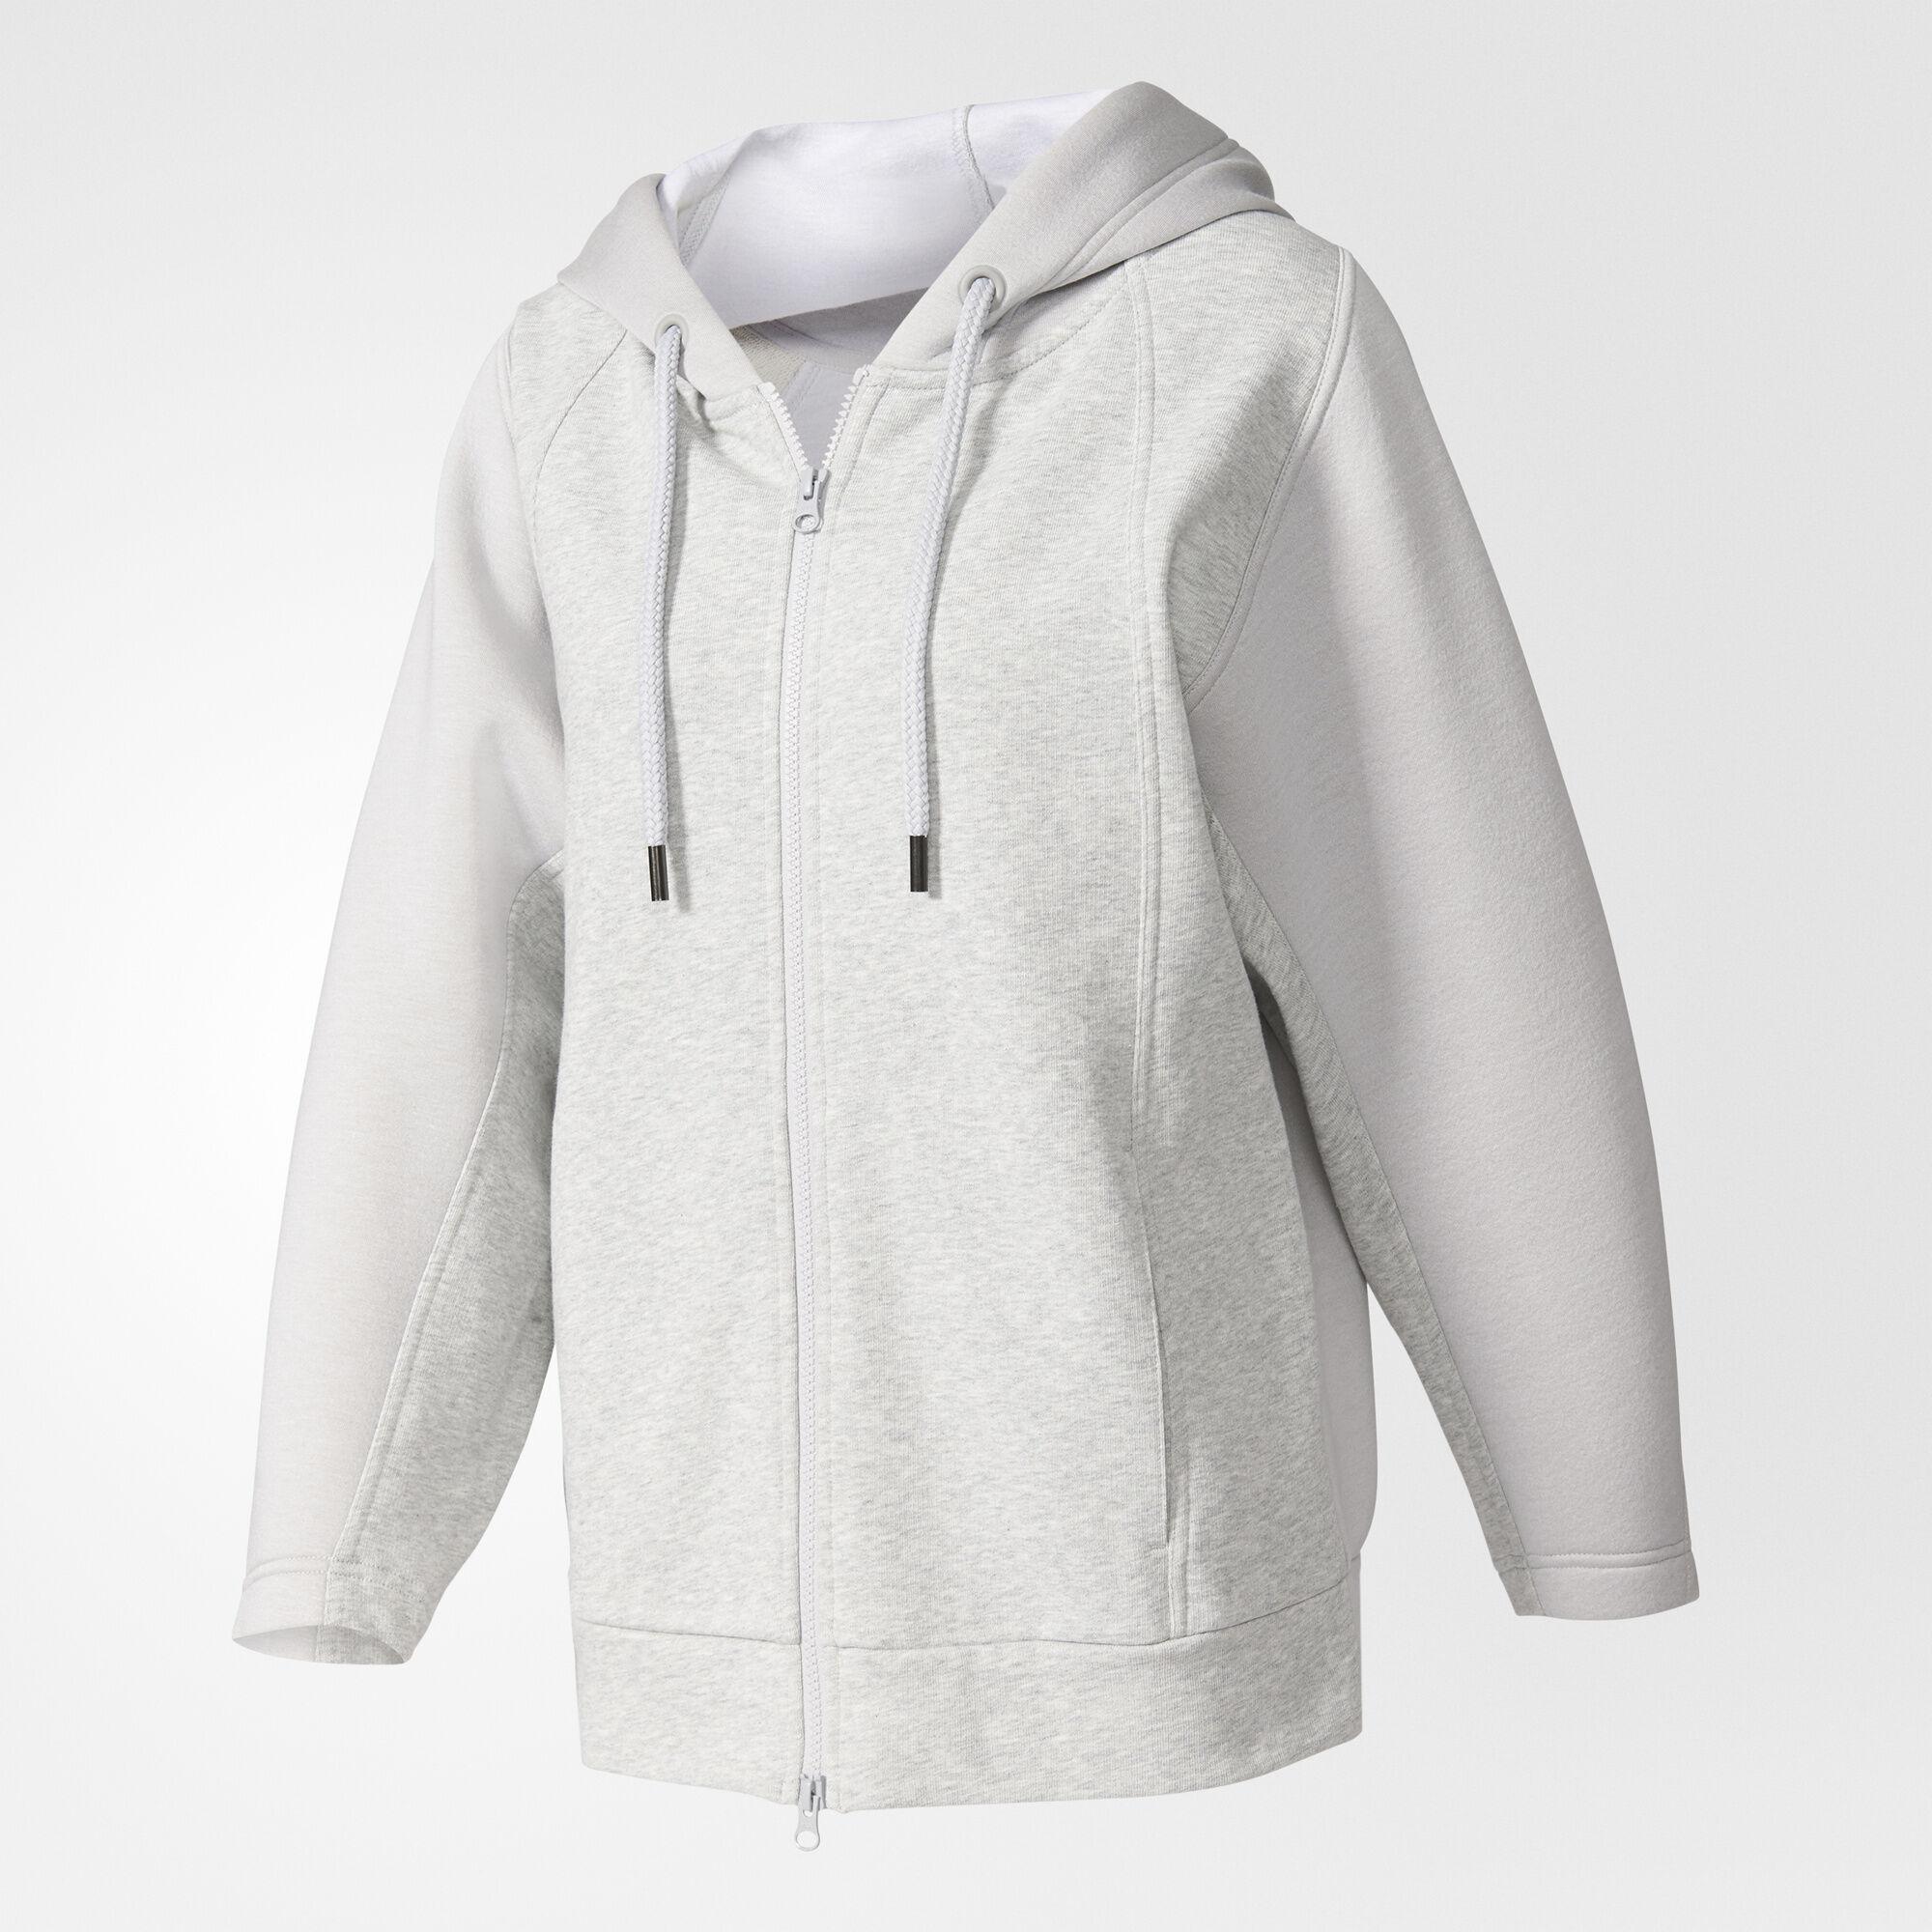 adidas - Essentials Hoodie Cool Grey Melange/Lgh Solid Grey BQ0774